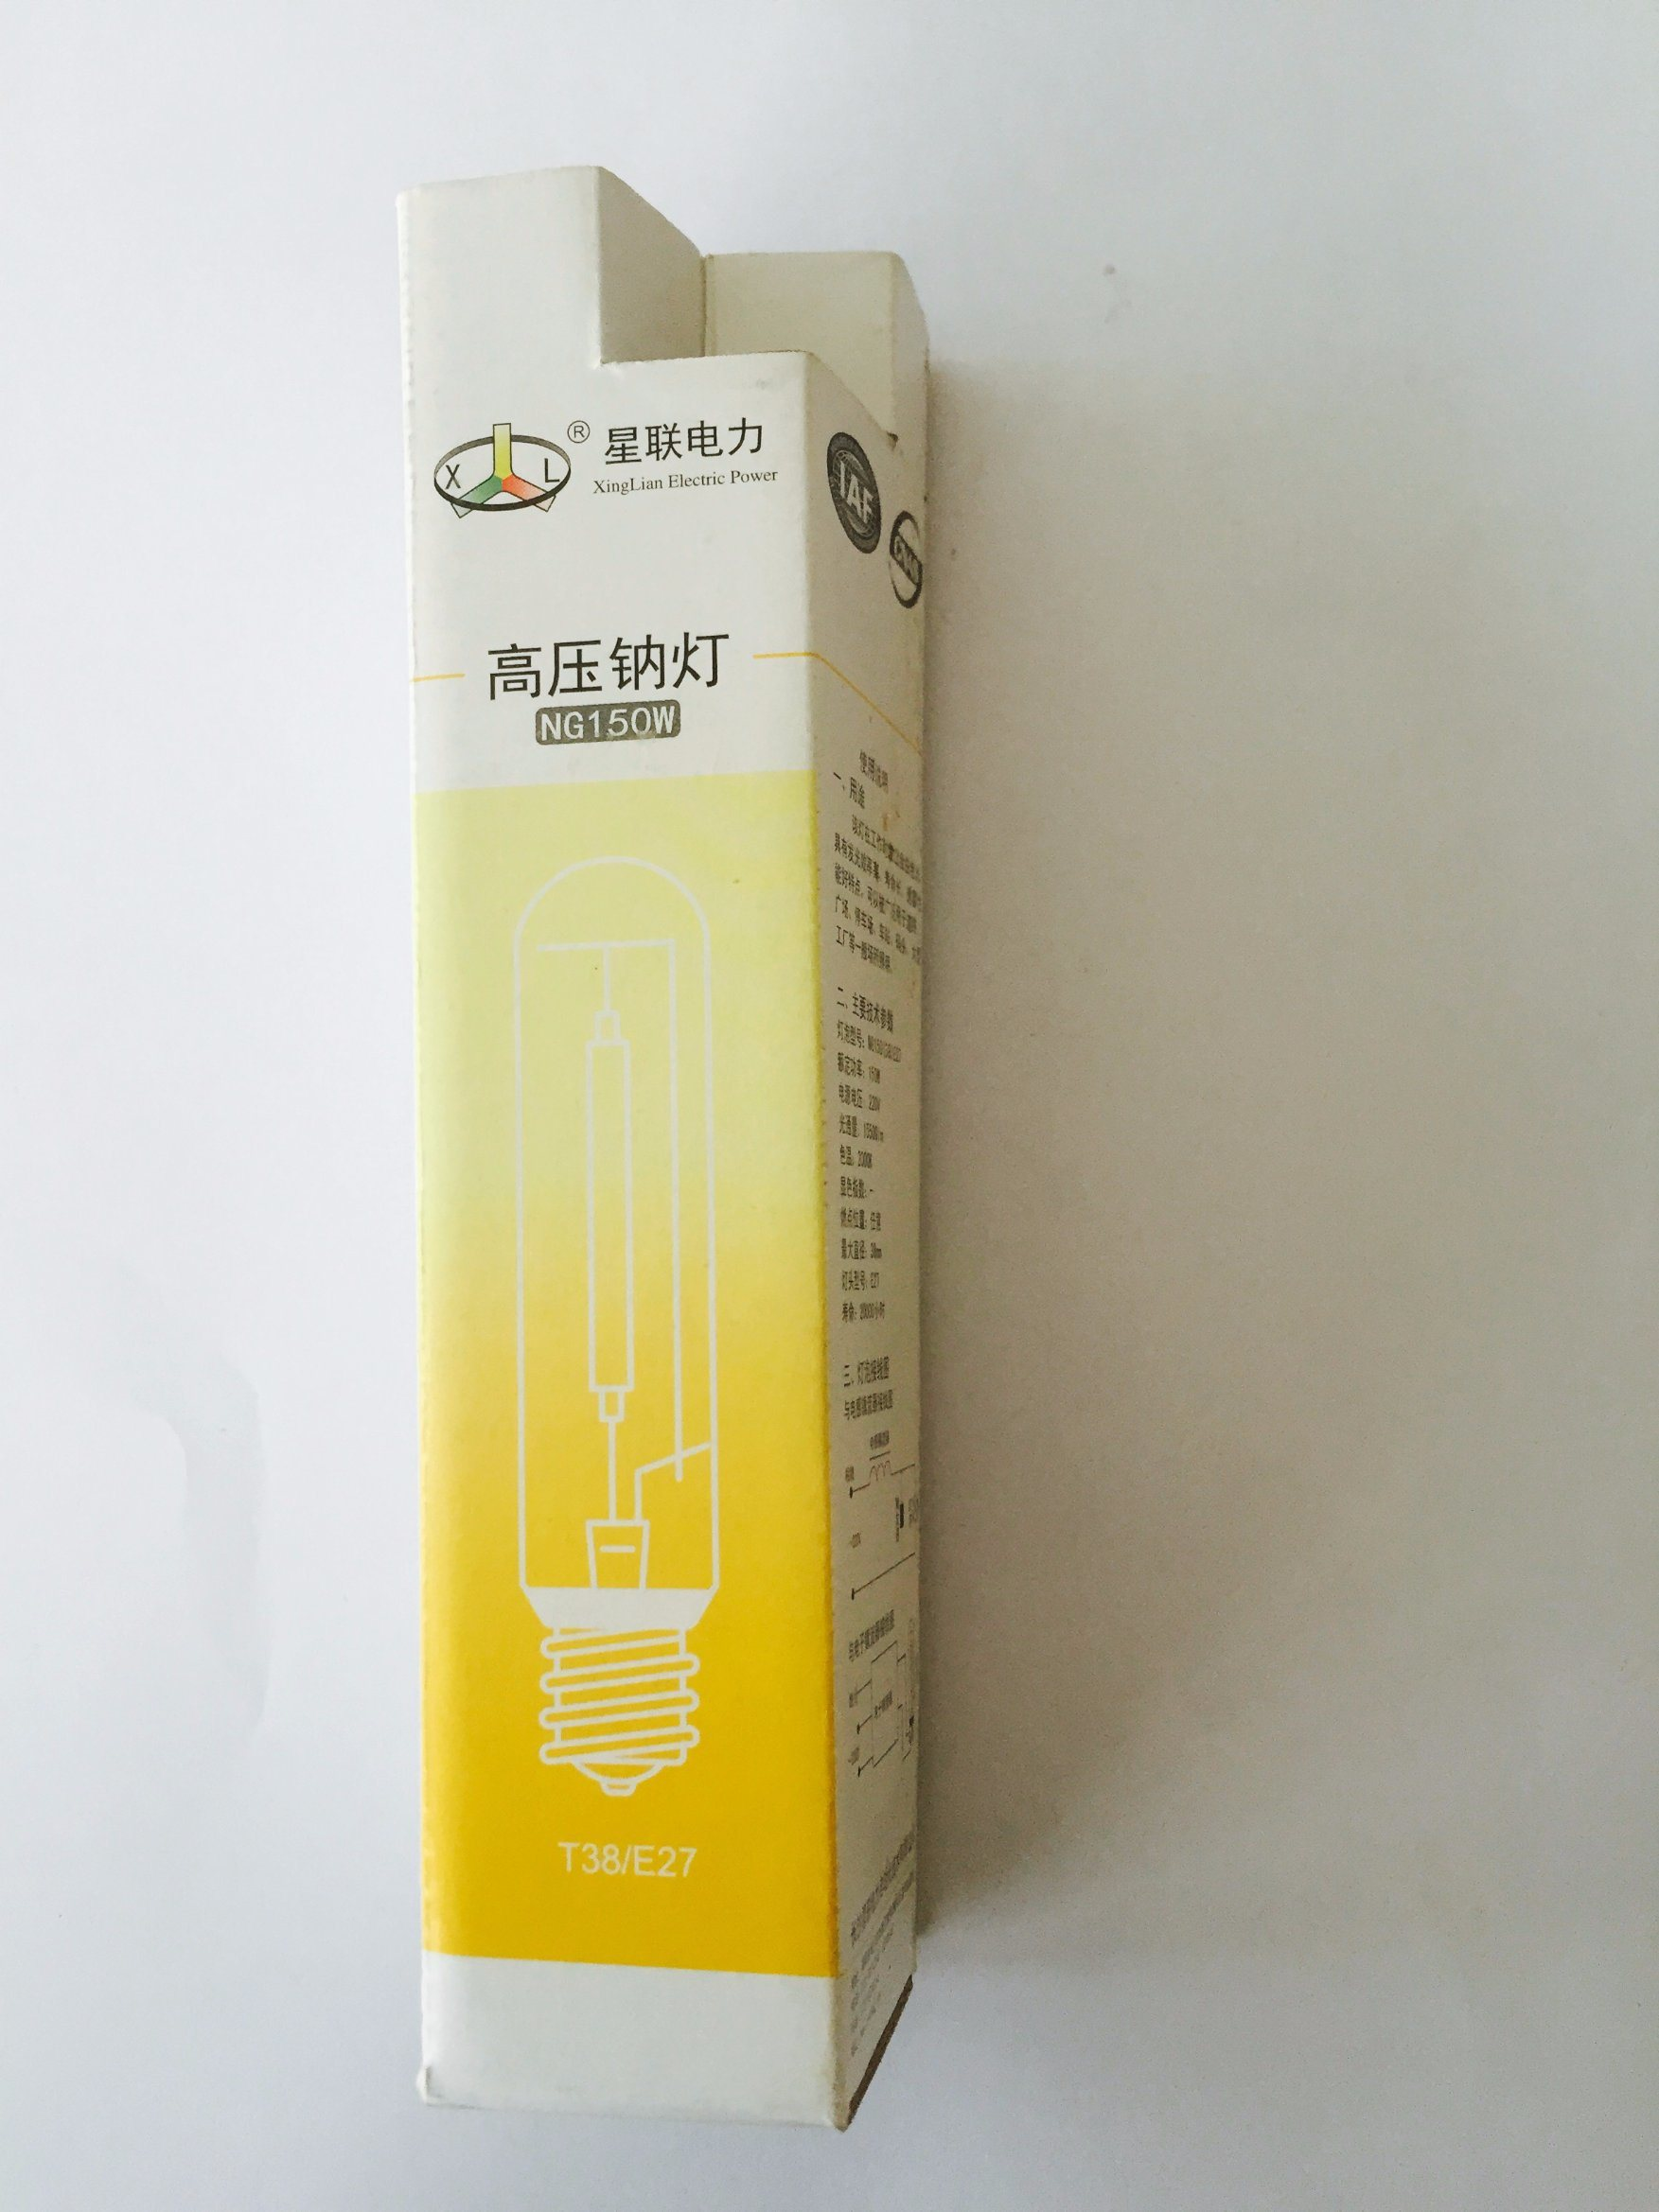 150W High Pressure Sodium Lamp